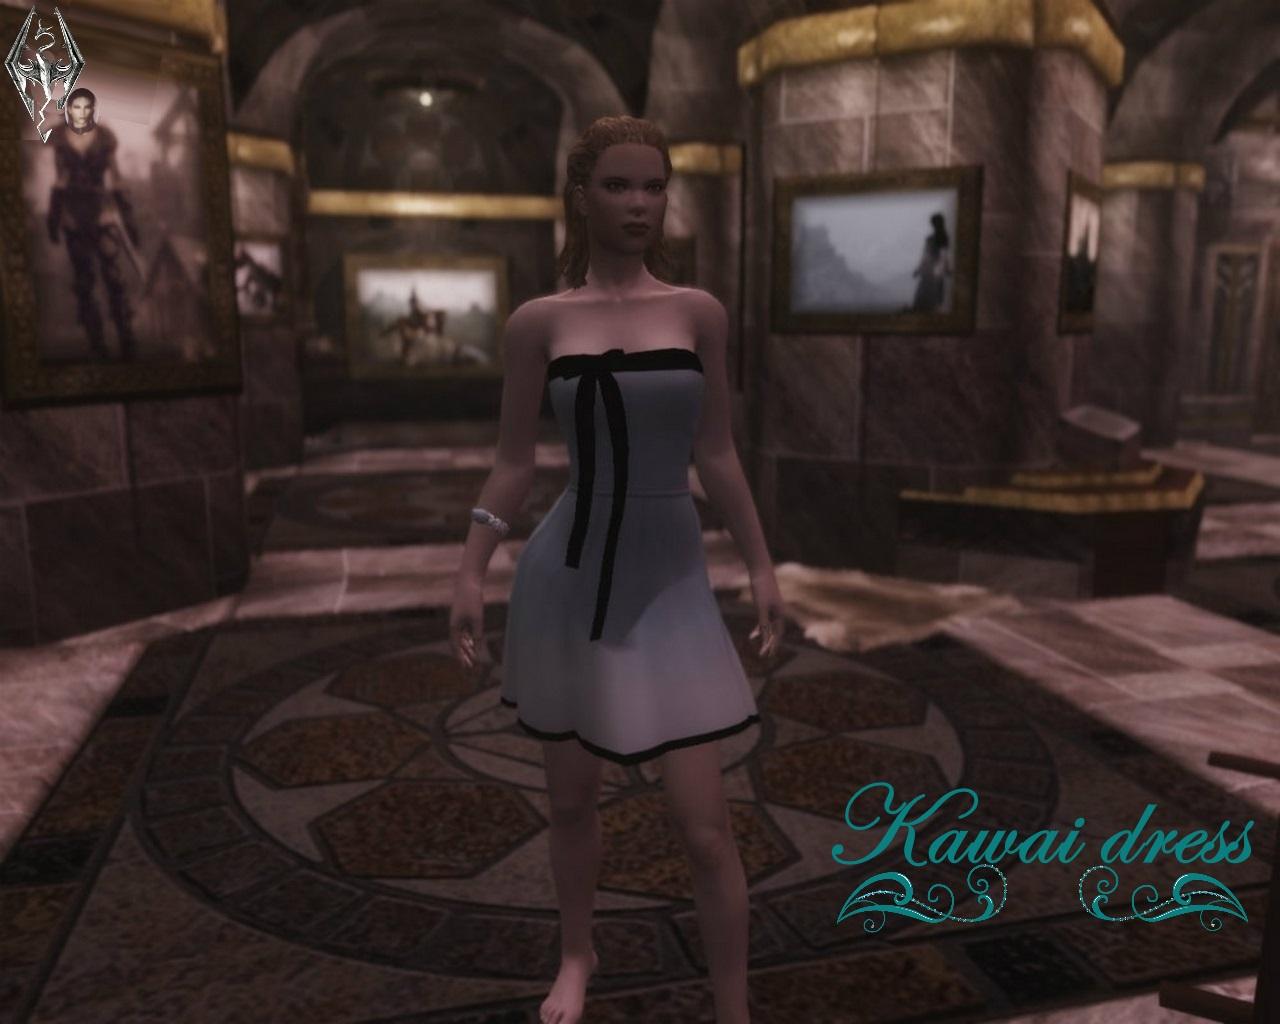 Kawai_dress.jpg